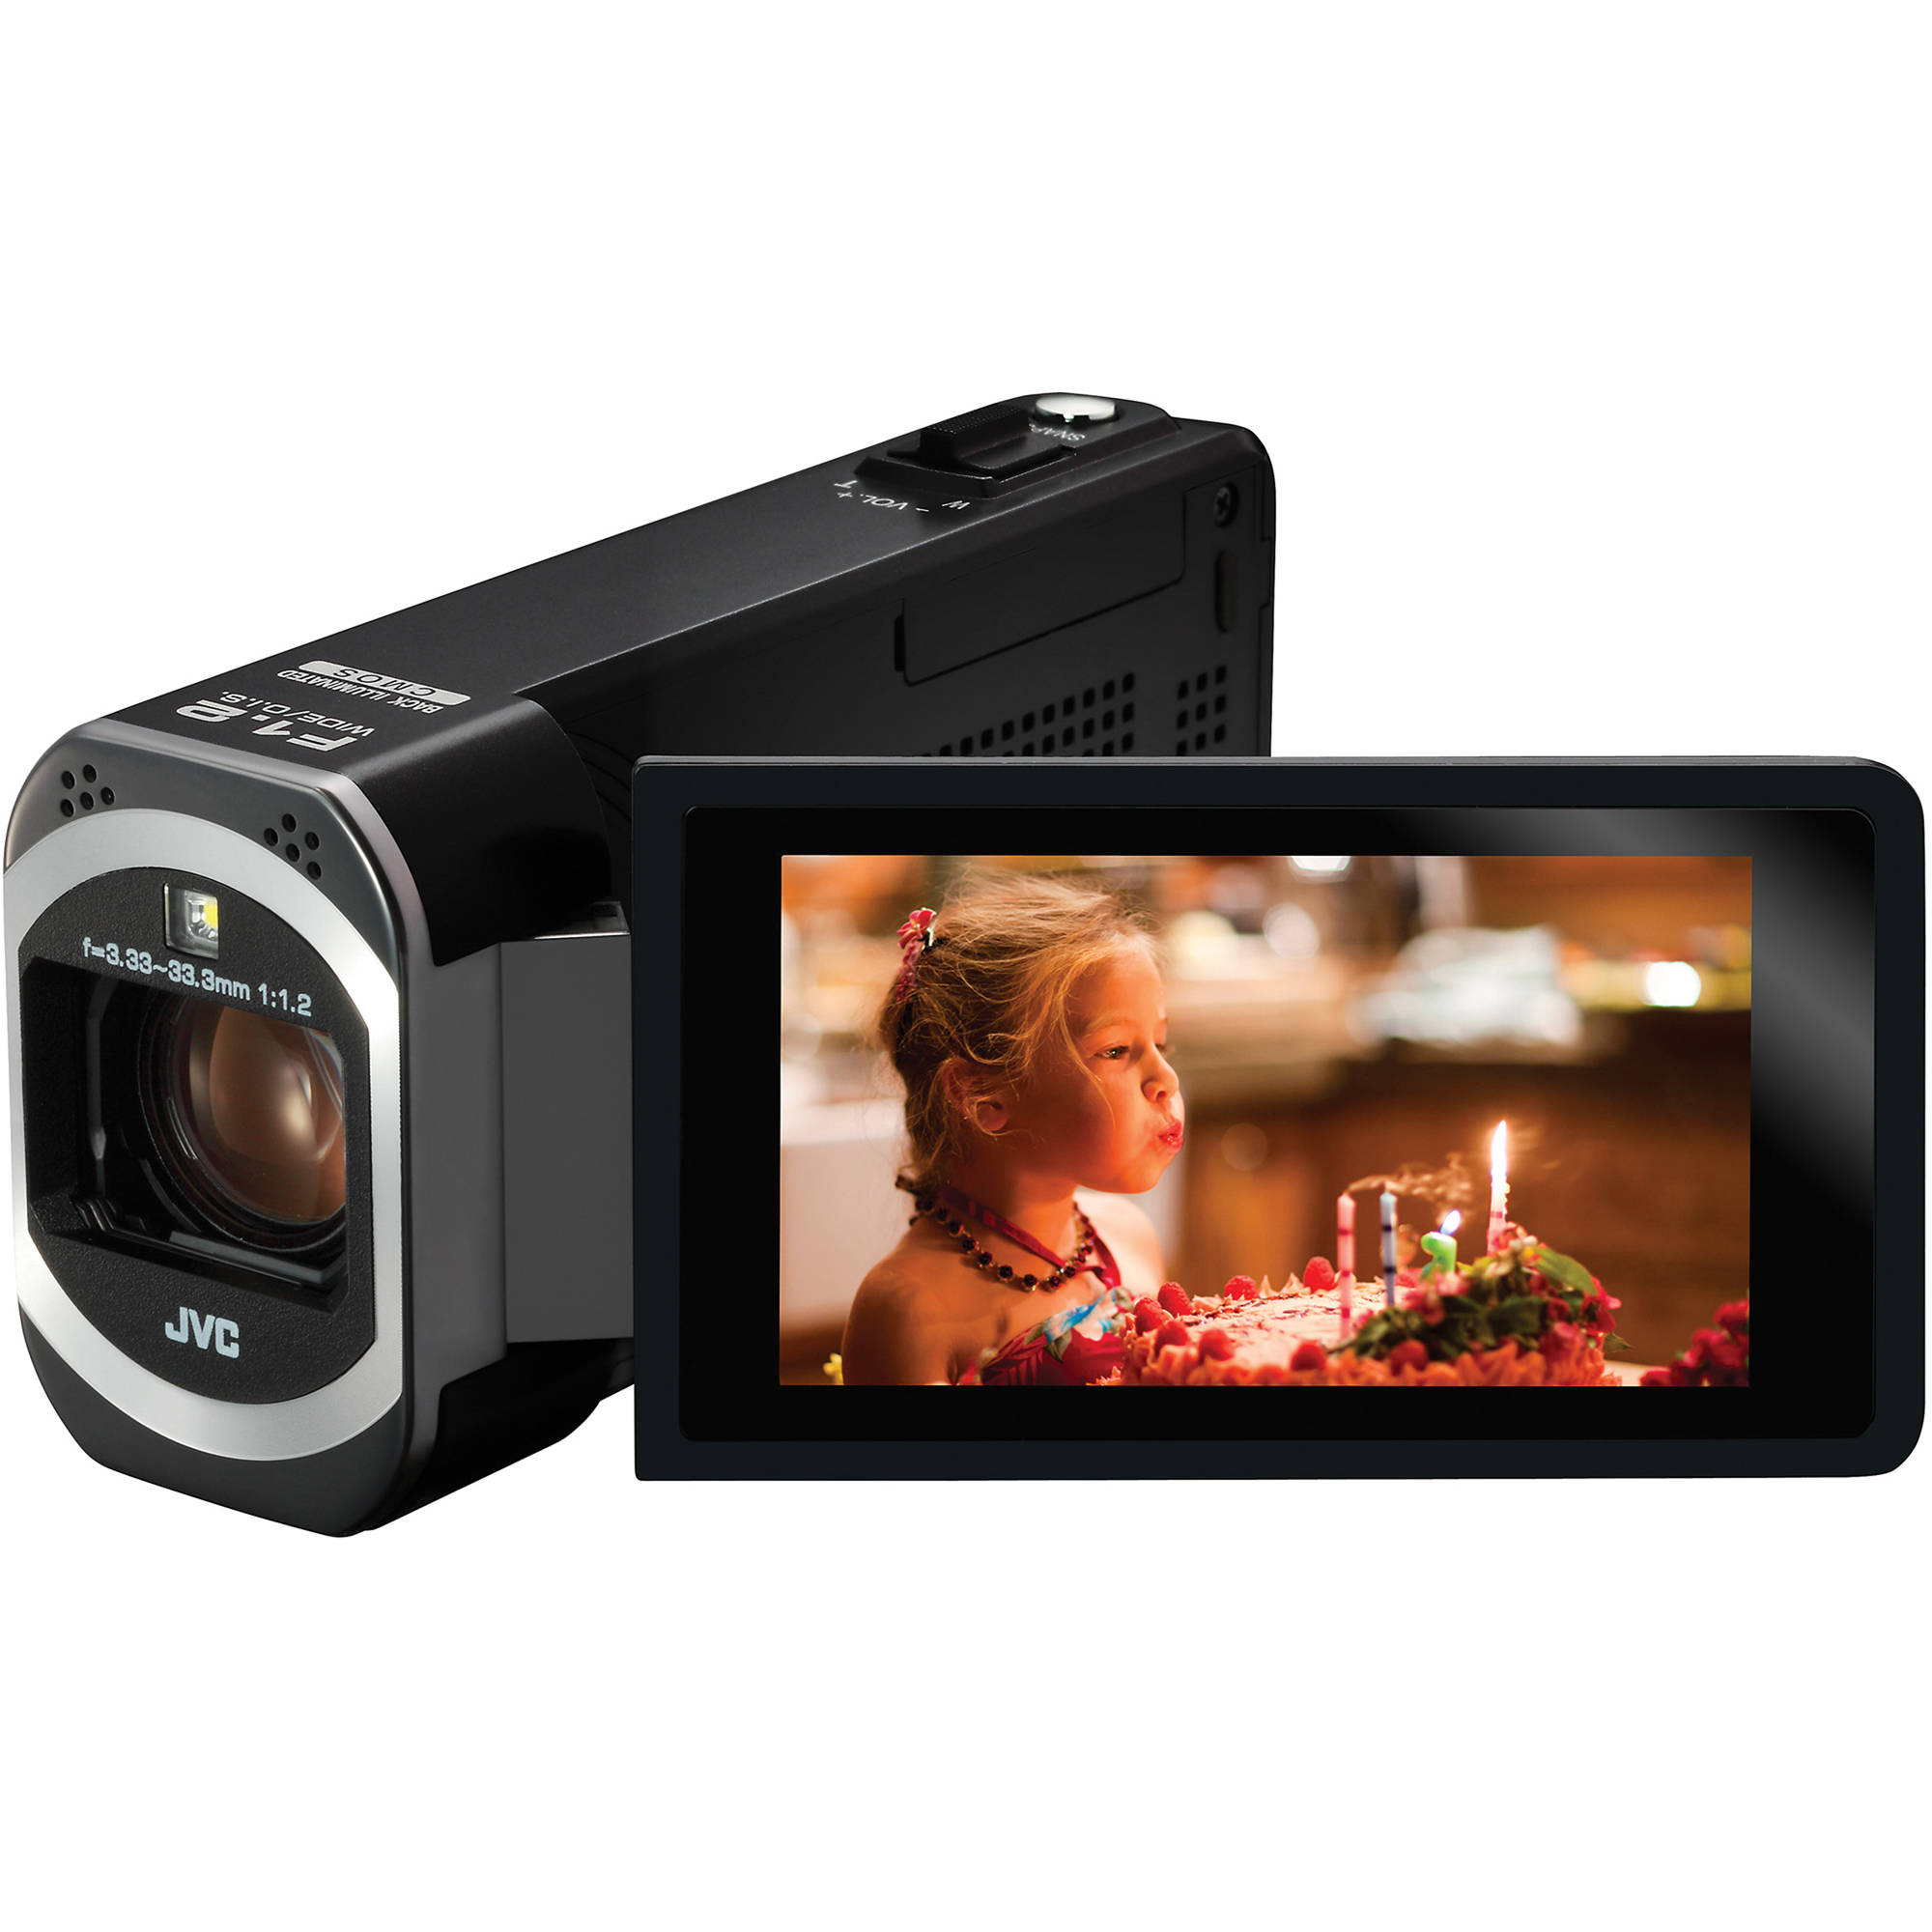 SDHC Memory Cards 2 Pack JVC GZ-V500 Camcorder Memory Card 2 x 32GB Secure Digital High Capacity